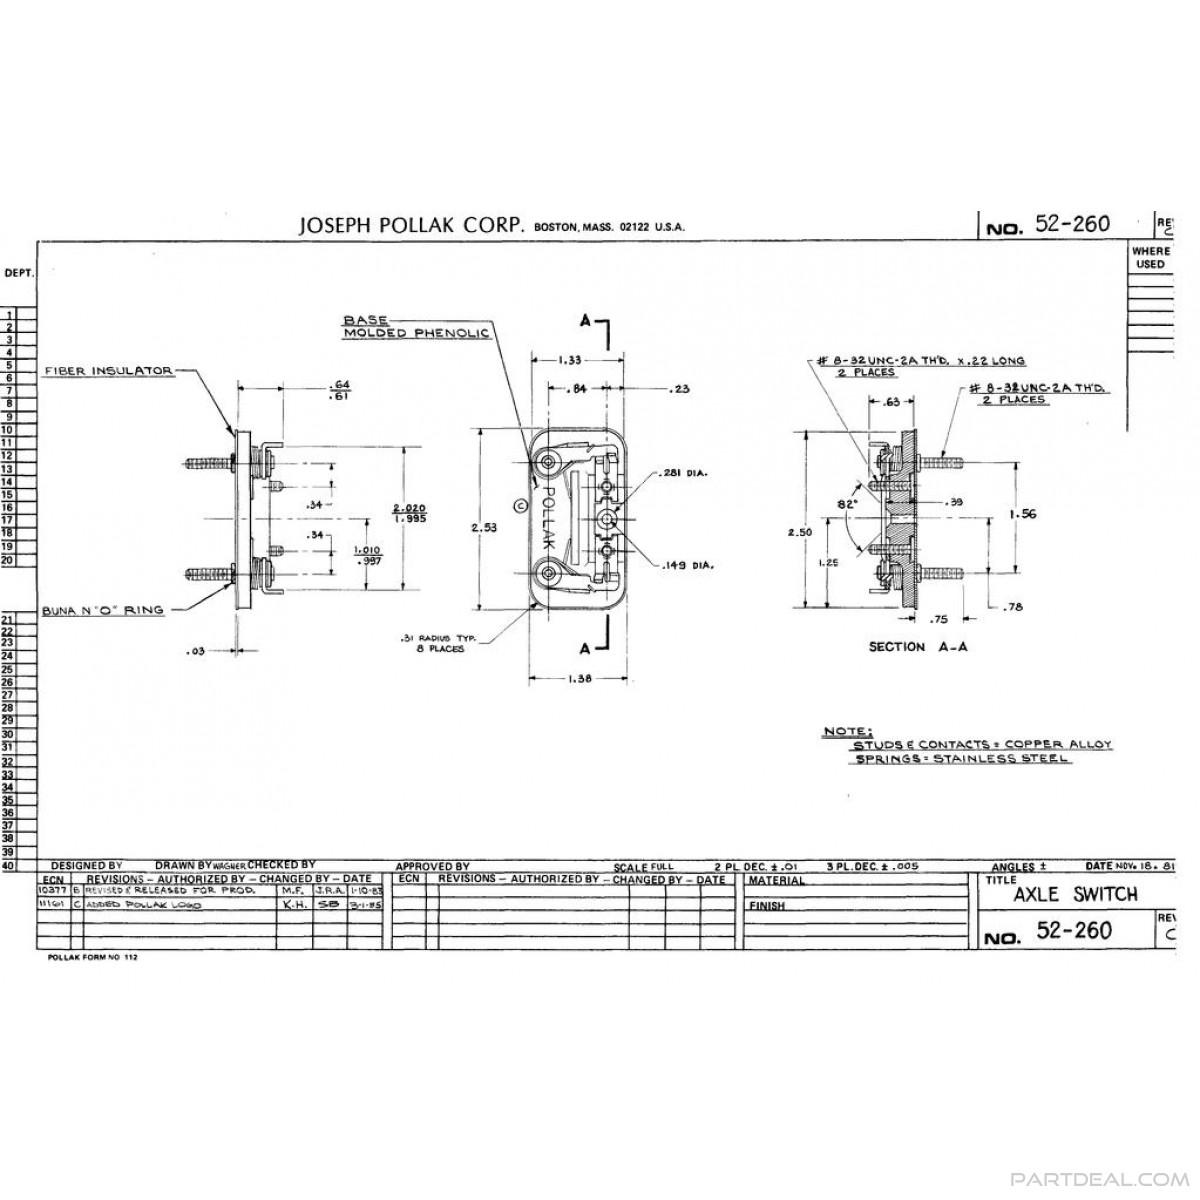 Pollak Rocker Switch Wiring Diagram List HD Quality Wiring Diagram  wireall.mindfulness-protocol.frmindfulness-protocol.fr